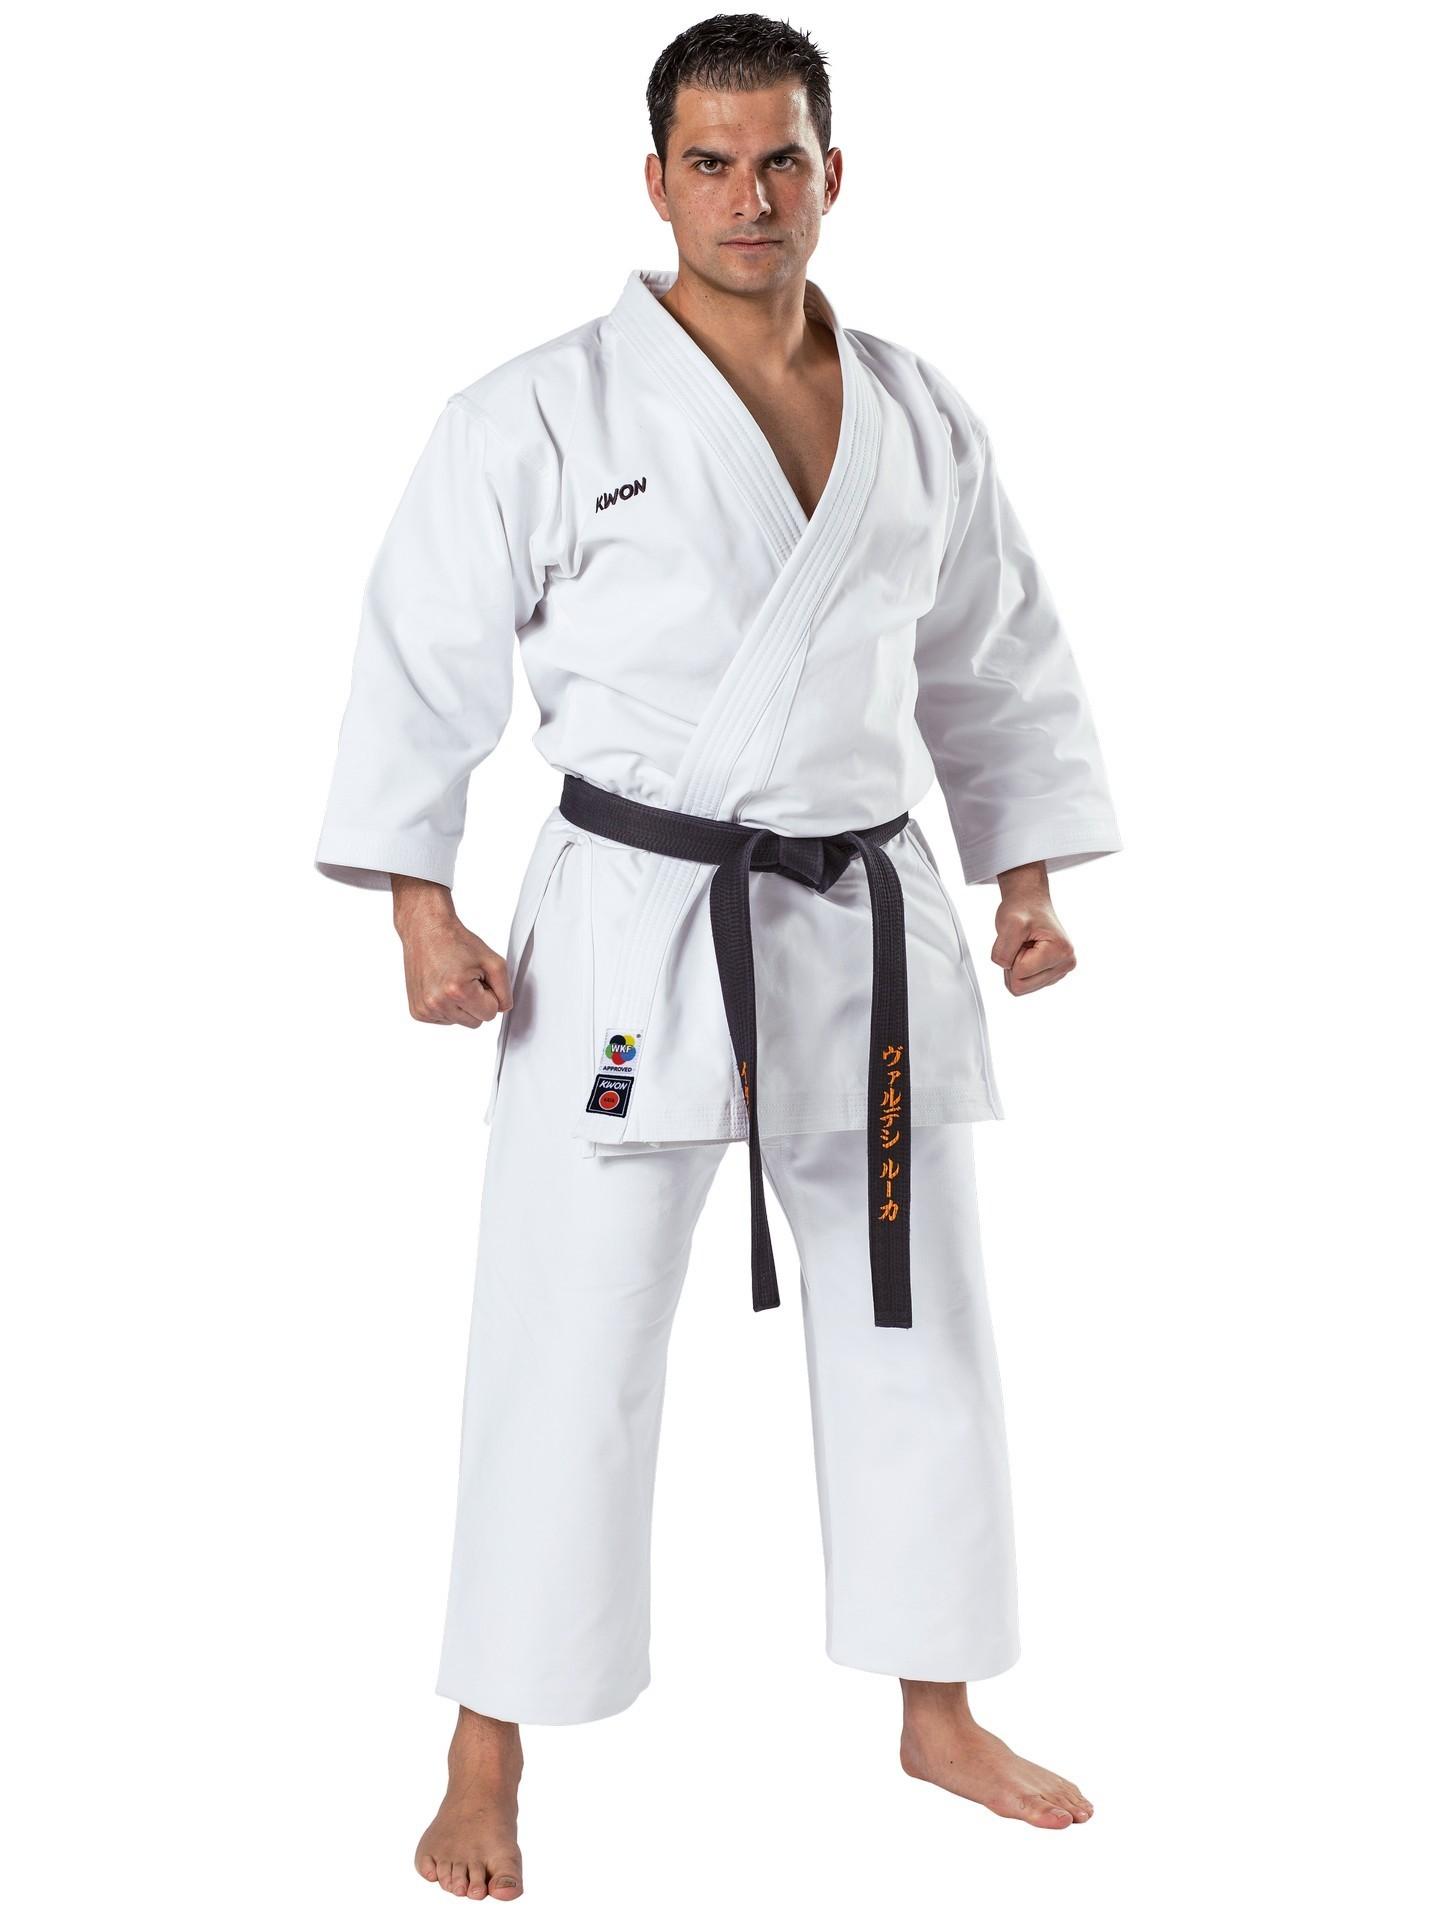 Karate kimono kata KWON 12oz. su kyokushin ženklu 180cm